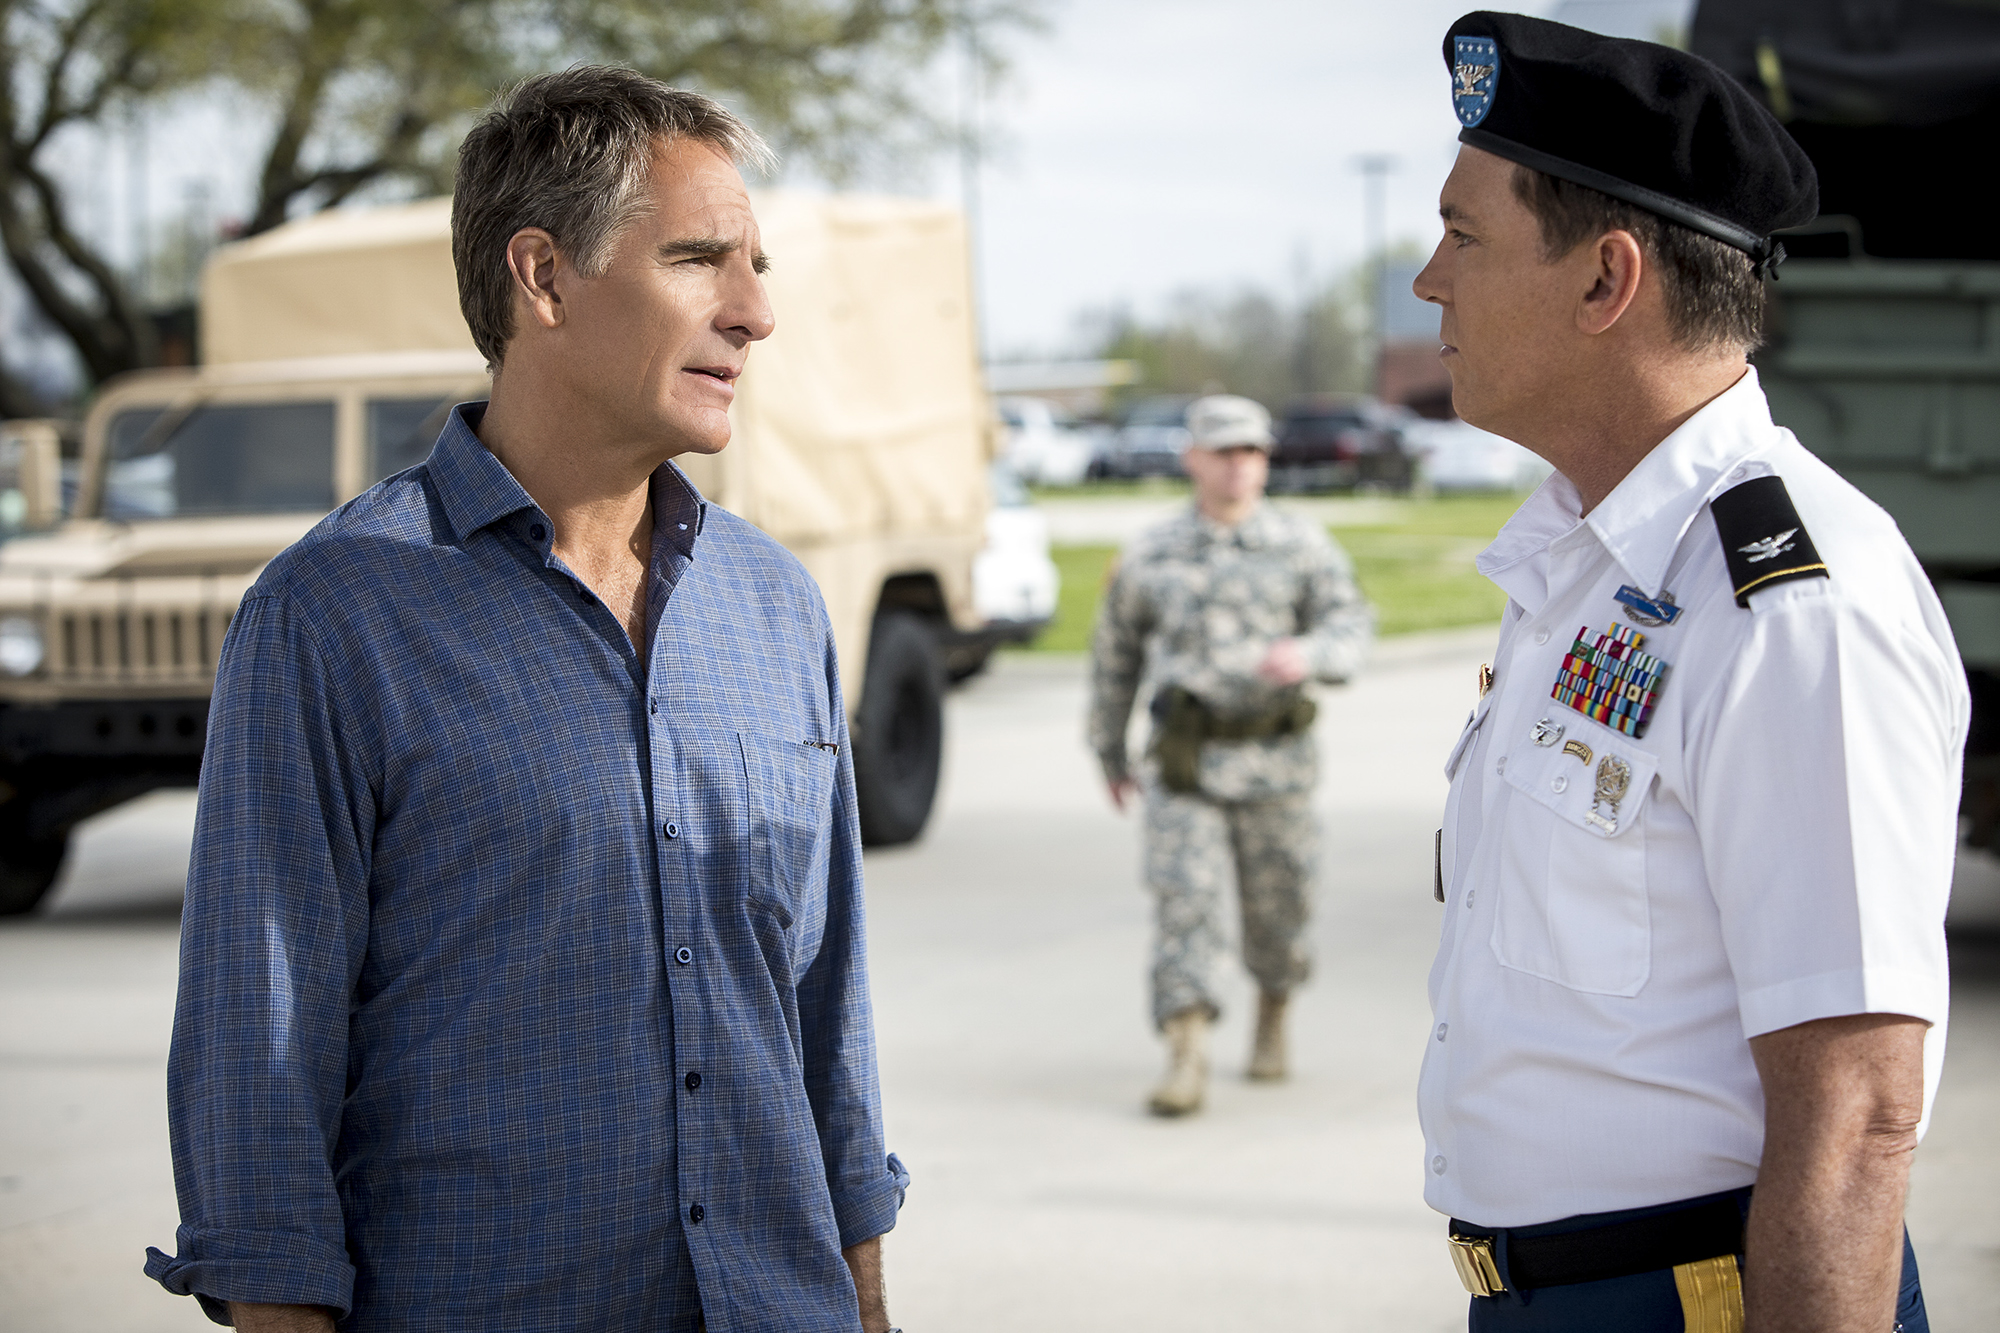 Scott Bakula as Special Agent Dwayne Pride and Nicholas Lea as Army Colonel Samuel Nilsen